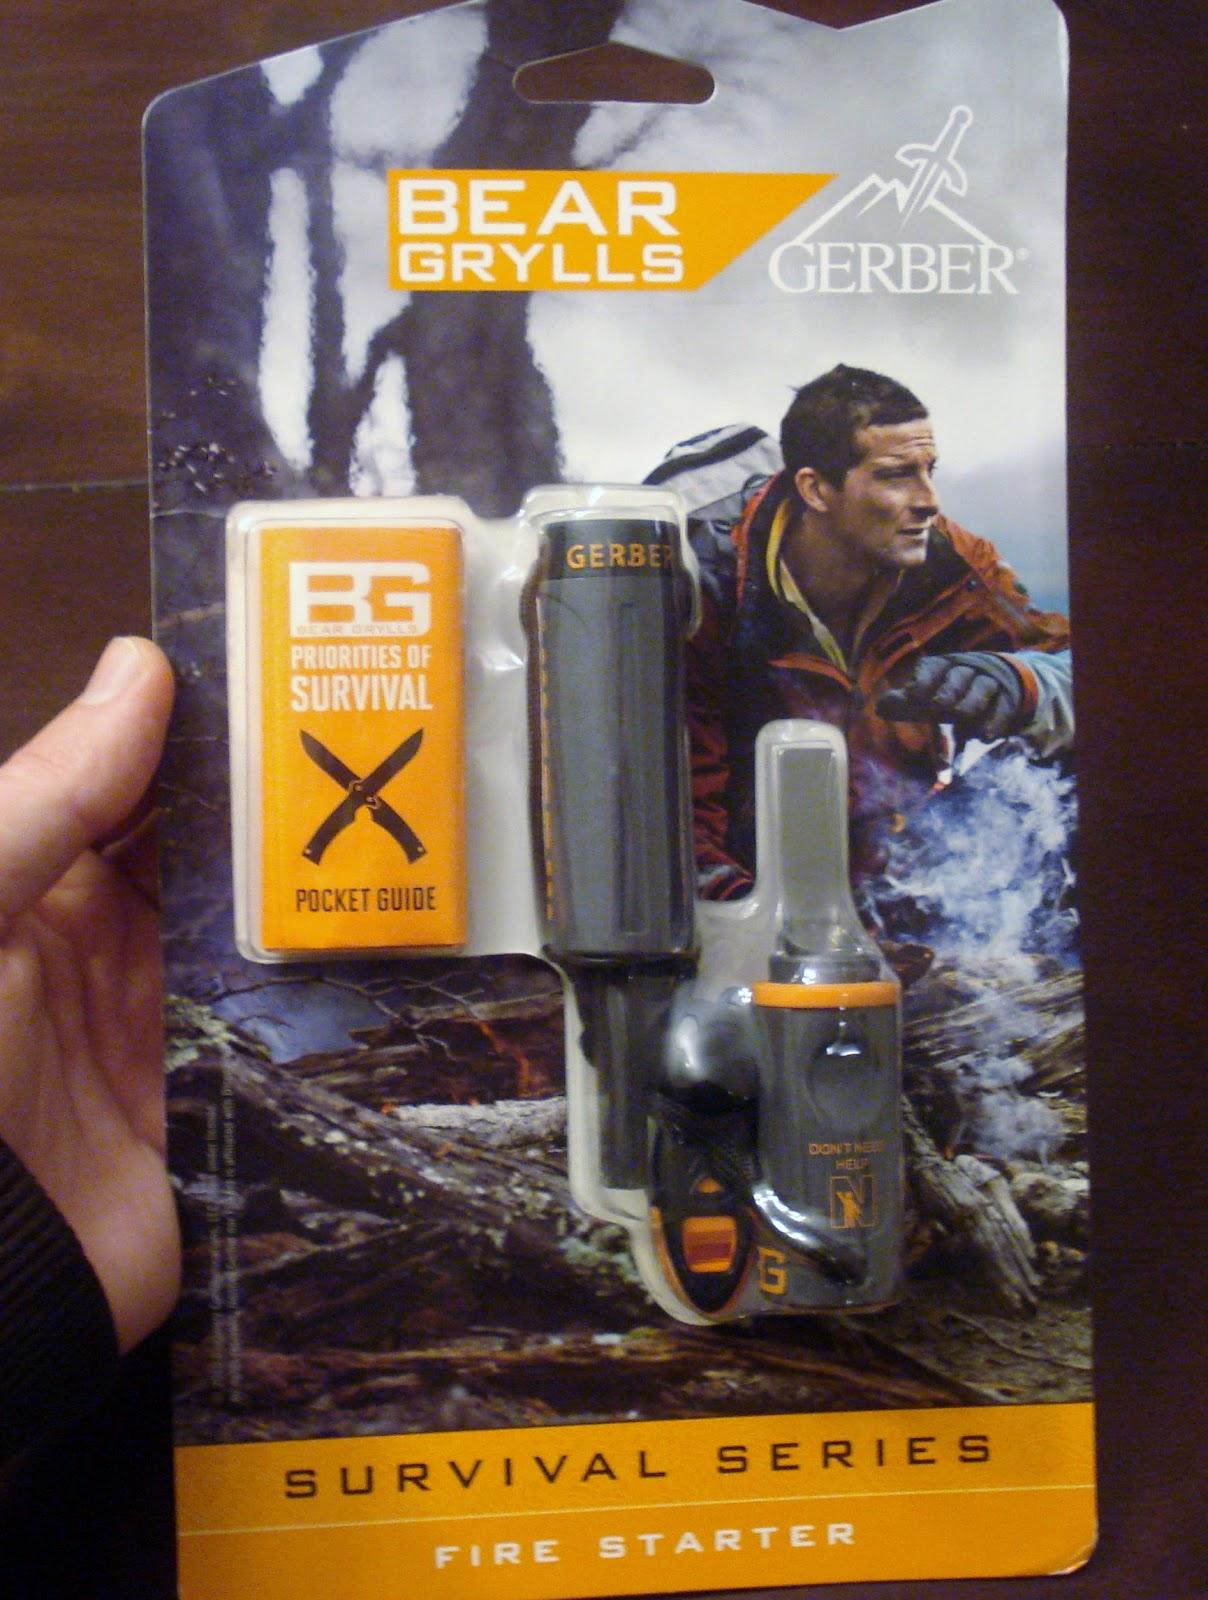 Bear Grylls Survival MASTER Series - 3741 *PRE-ORDER ...  |Bear Grylls Survival Series